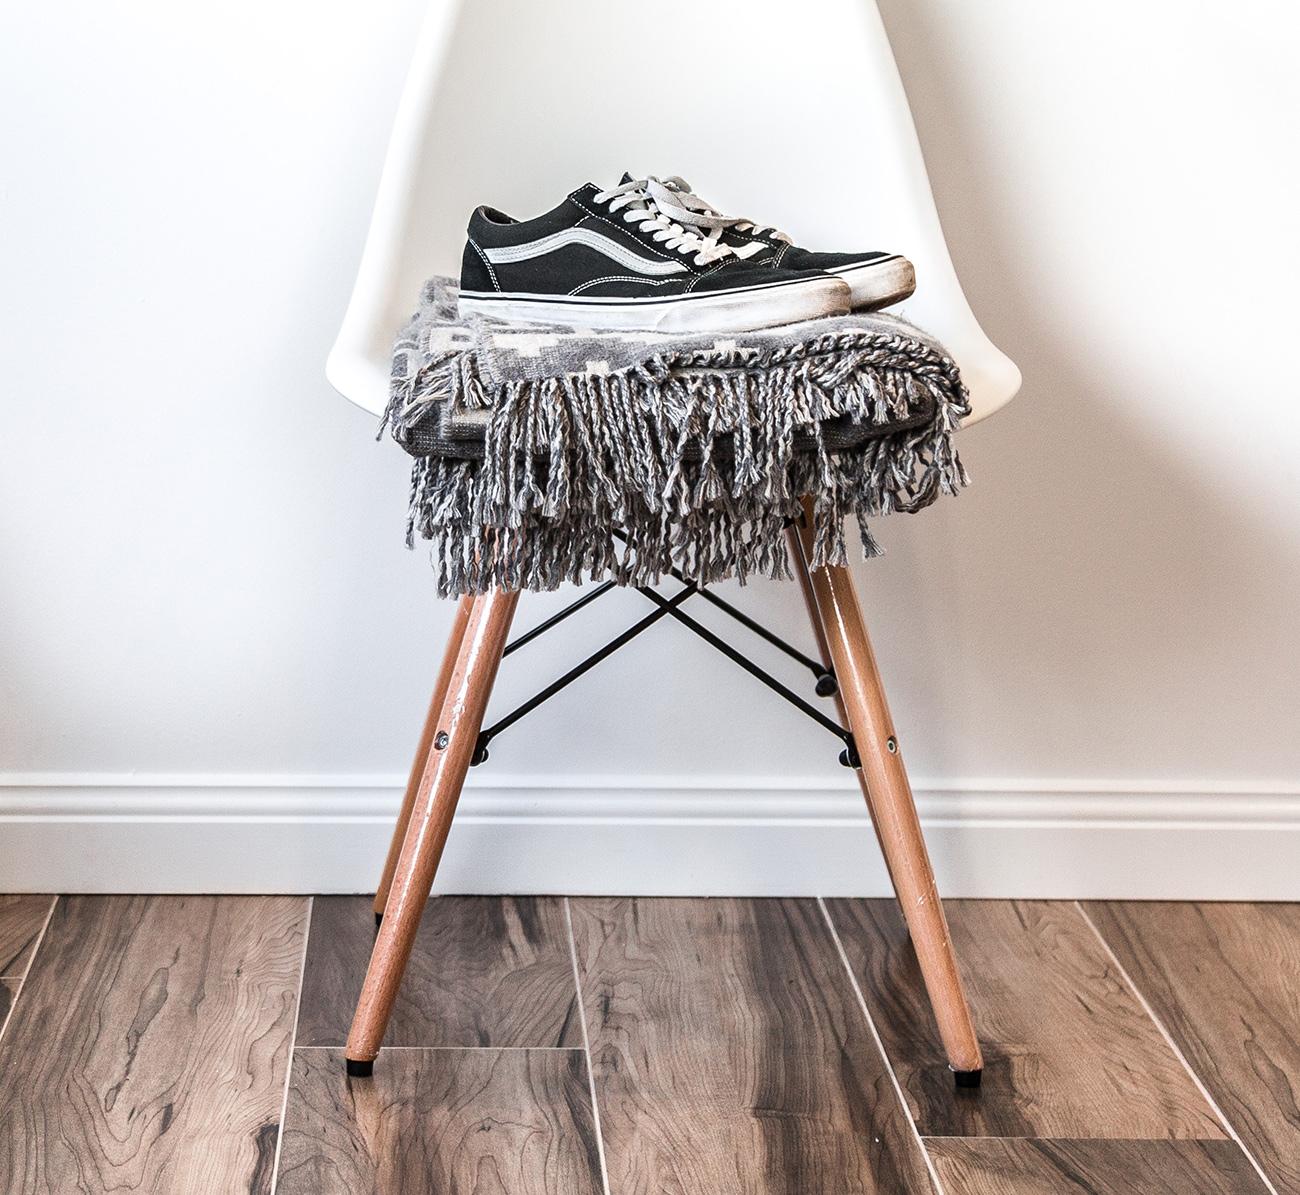 Ai pantofi buni, pe care nu-i mai porti? Da-i mai departe!